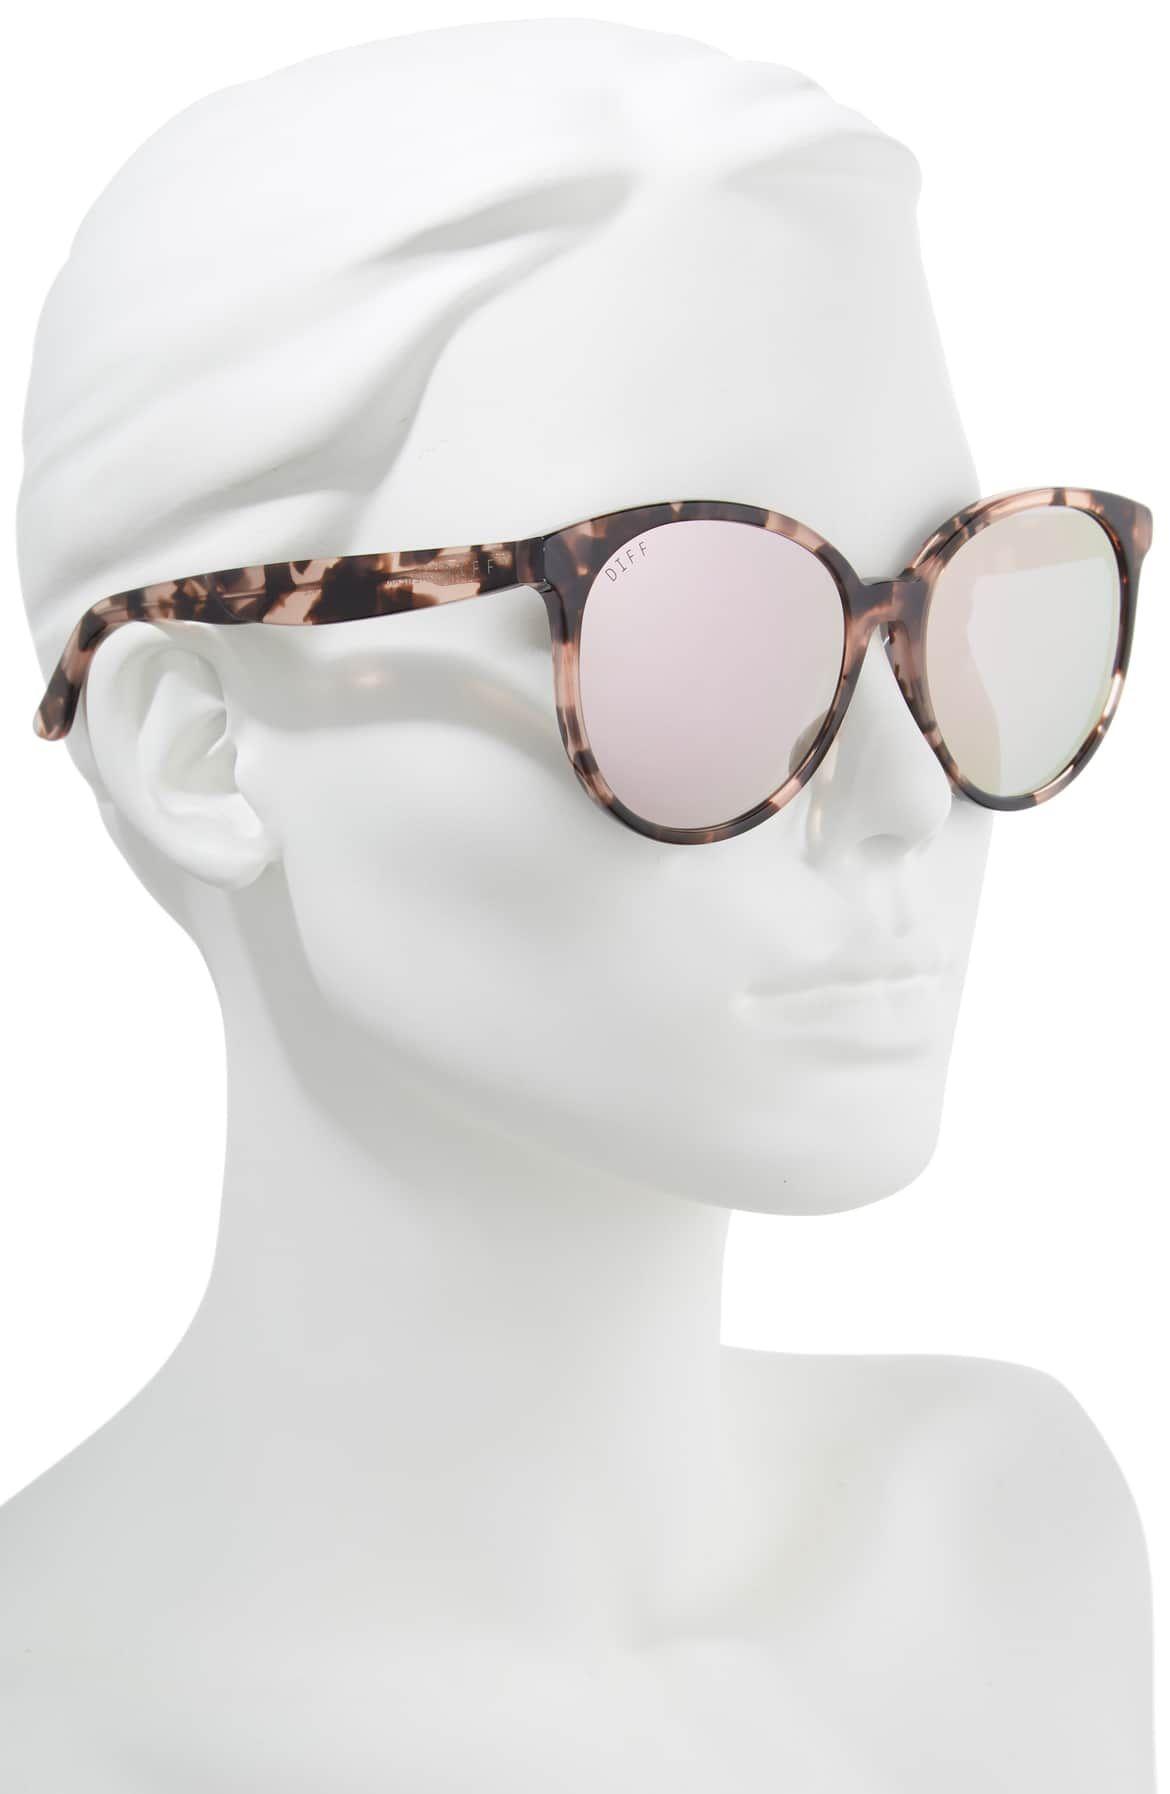 0395676b76 Cosmo 56mm Polarized Round Sunglasses